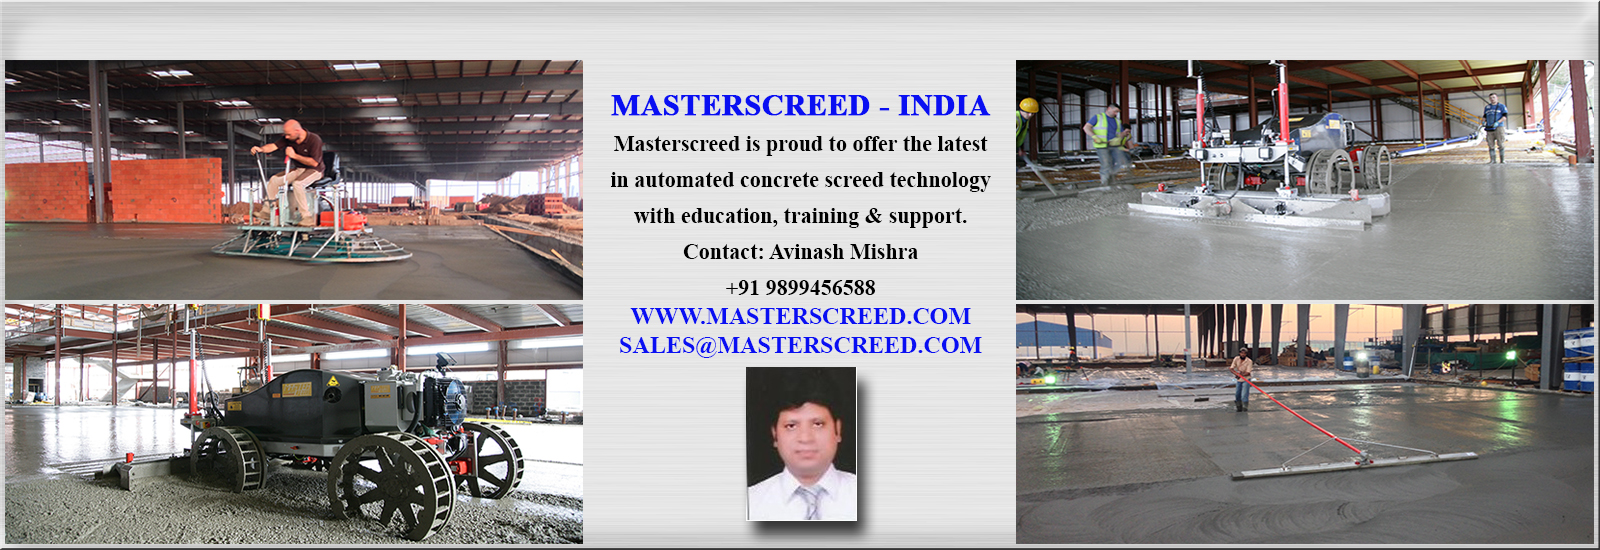 Masterscreed India